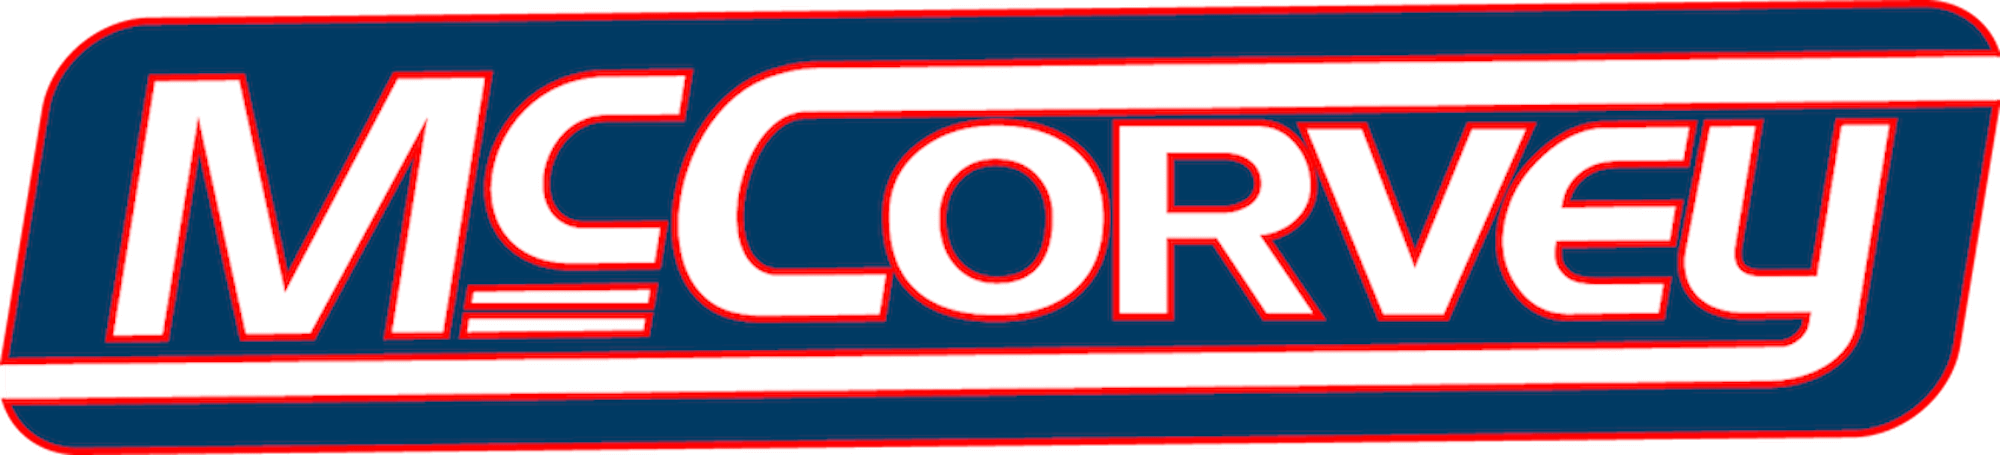 Logotipo da McCorvey